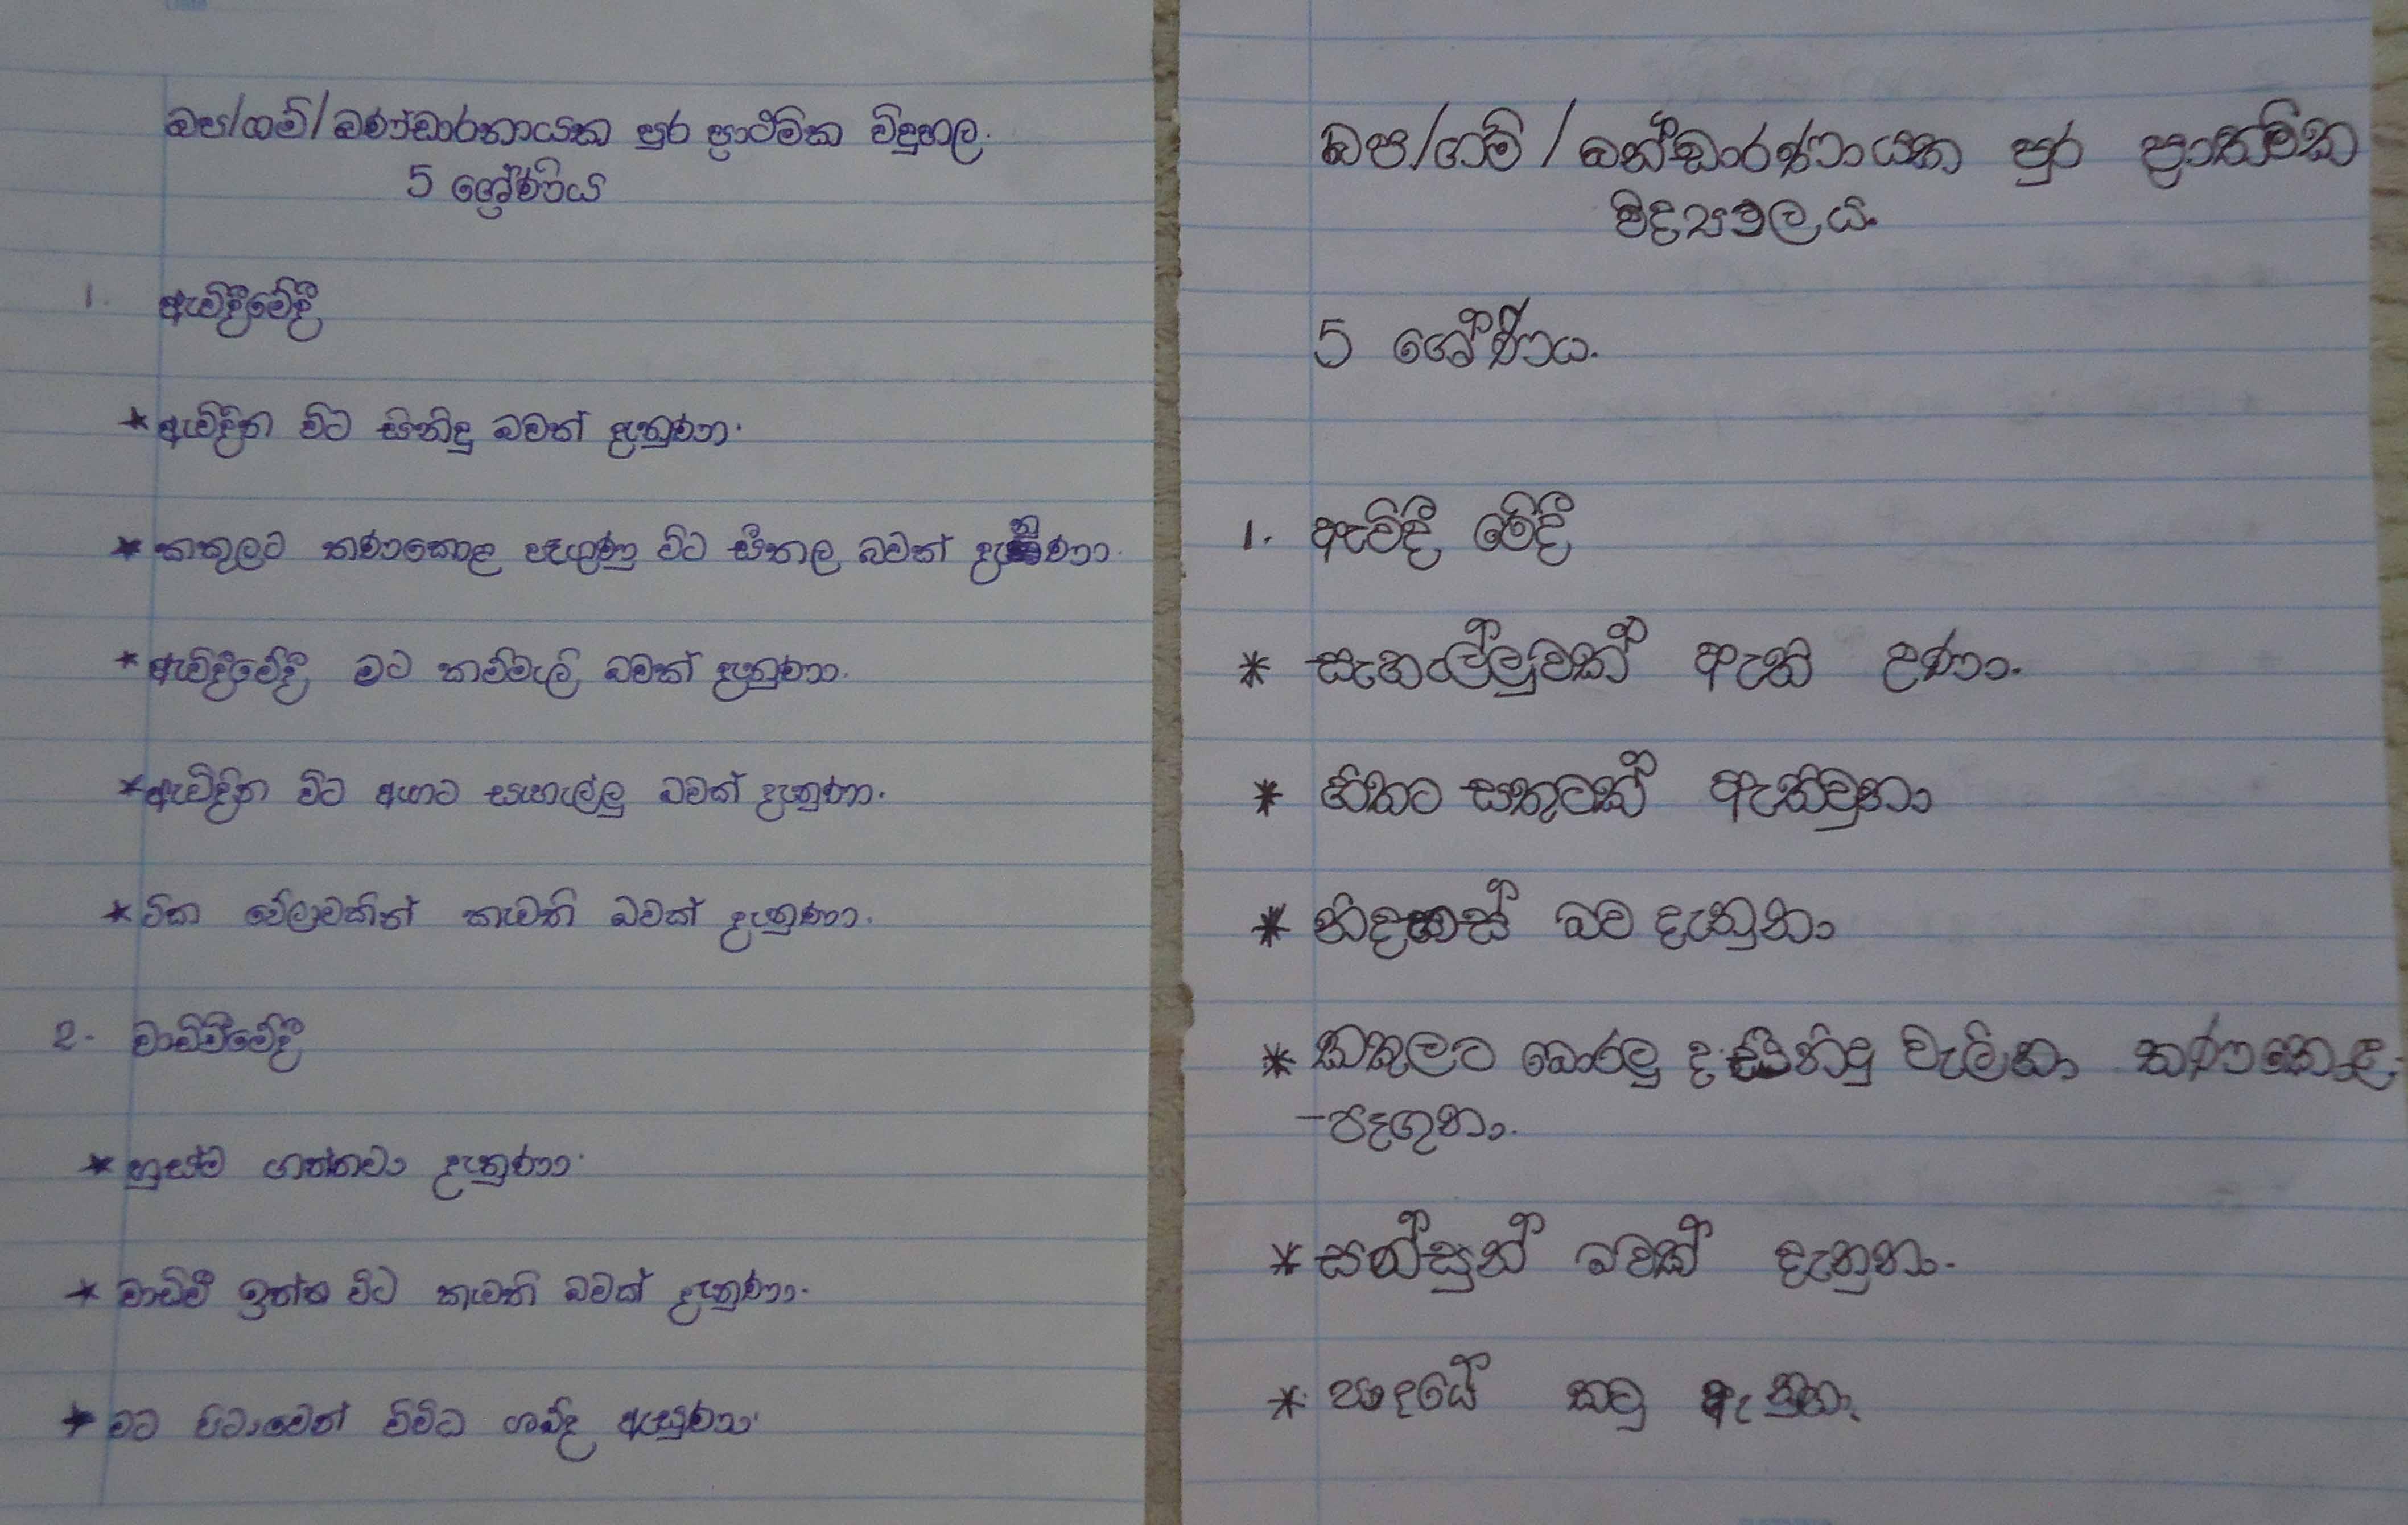 Feedback from students-WP GM Bandaranayakepura Primary School, Kirindiwela (9)